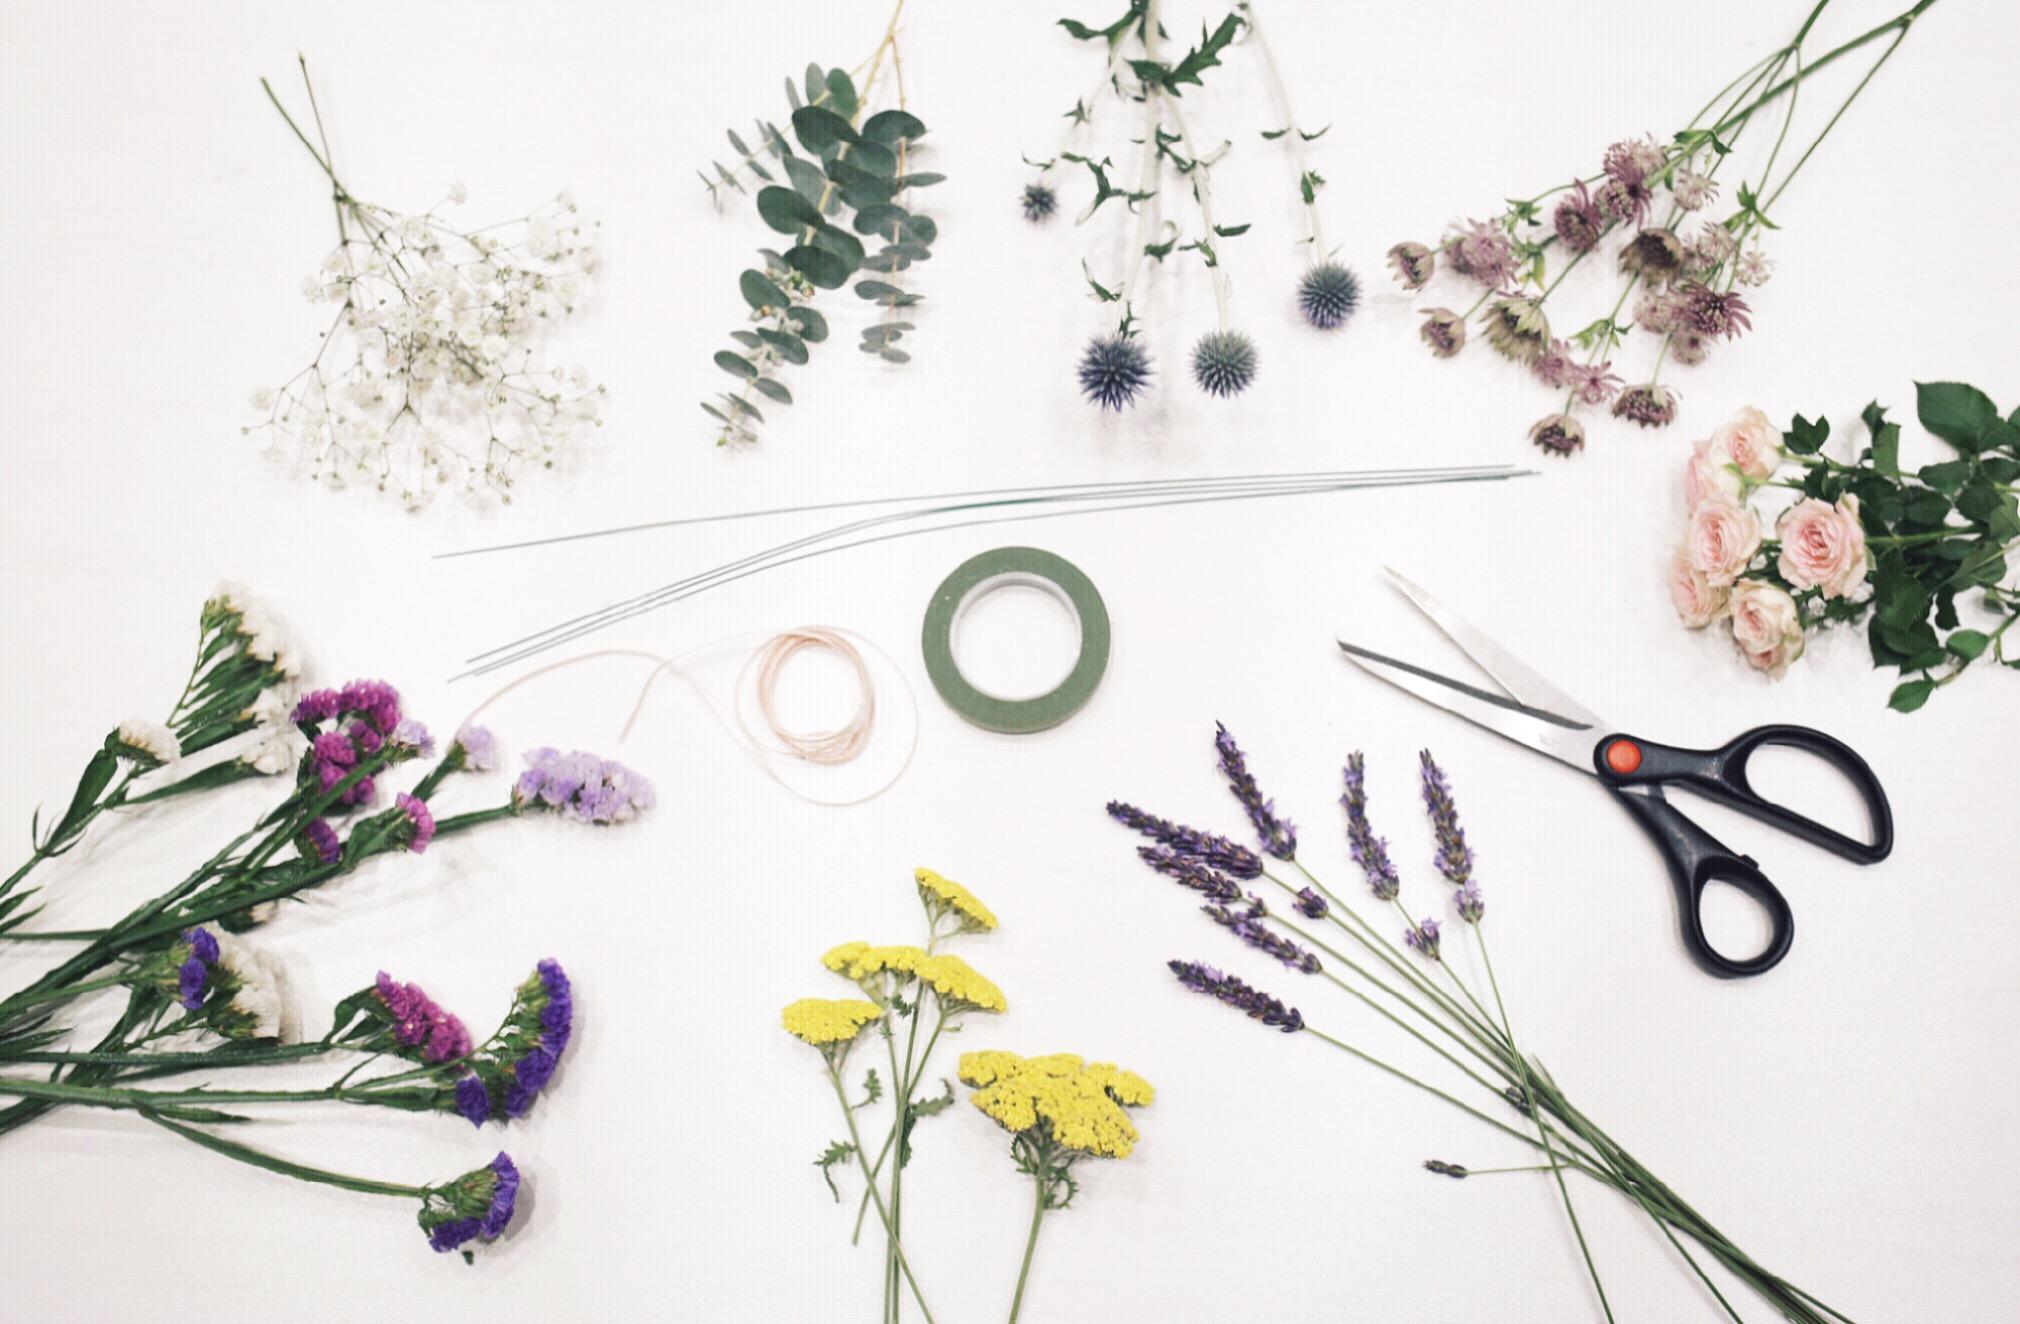 tuto diy la couronne de fleurs fraiches zo bassetto. Black Bedroom Furniture Sets. Home Design Ideas